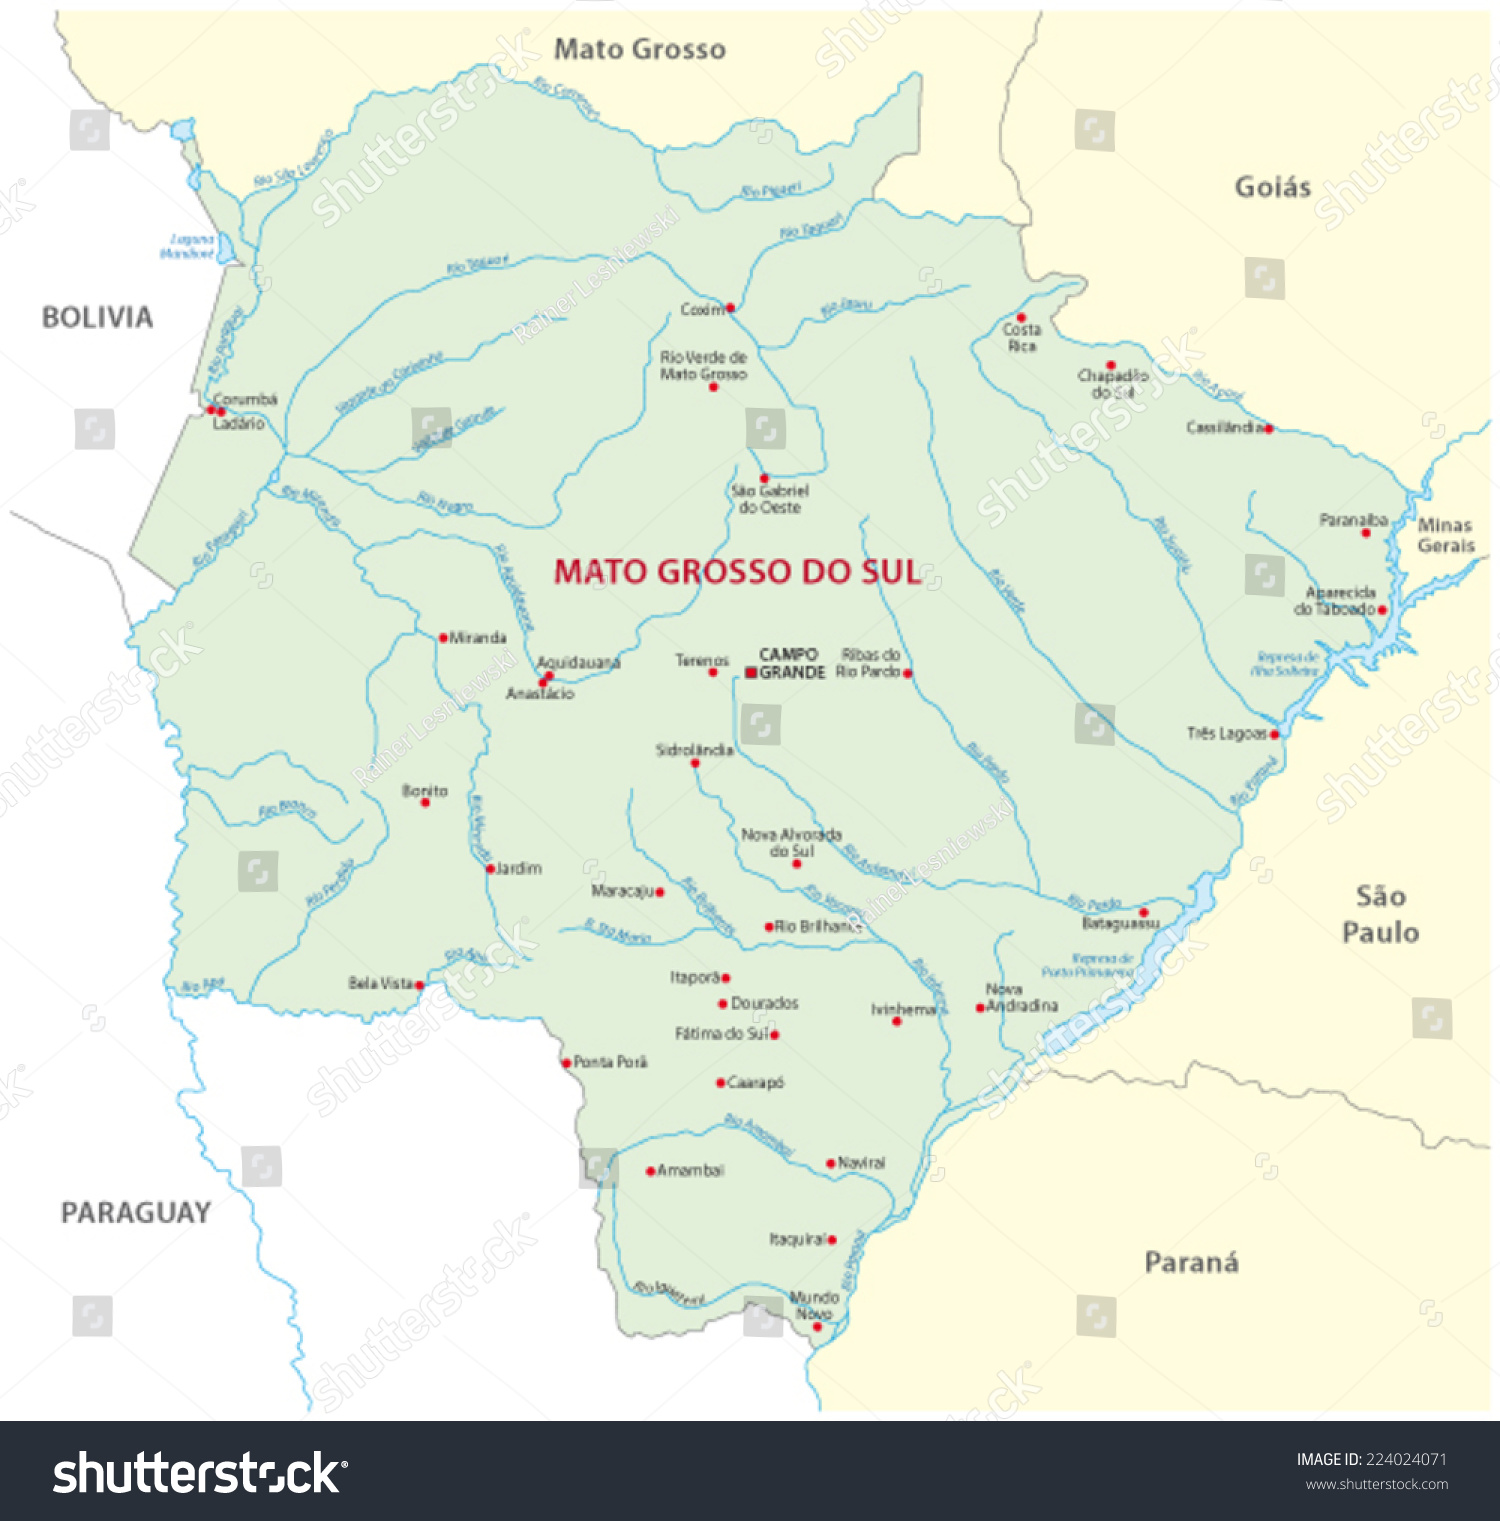 Mato Grosso Do Sul Map Stock Vector (Royalty Free) 224024071